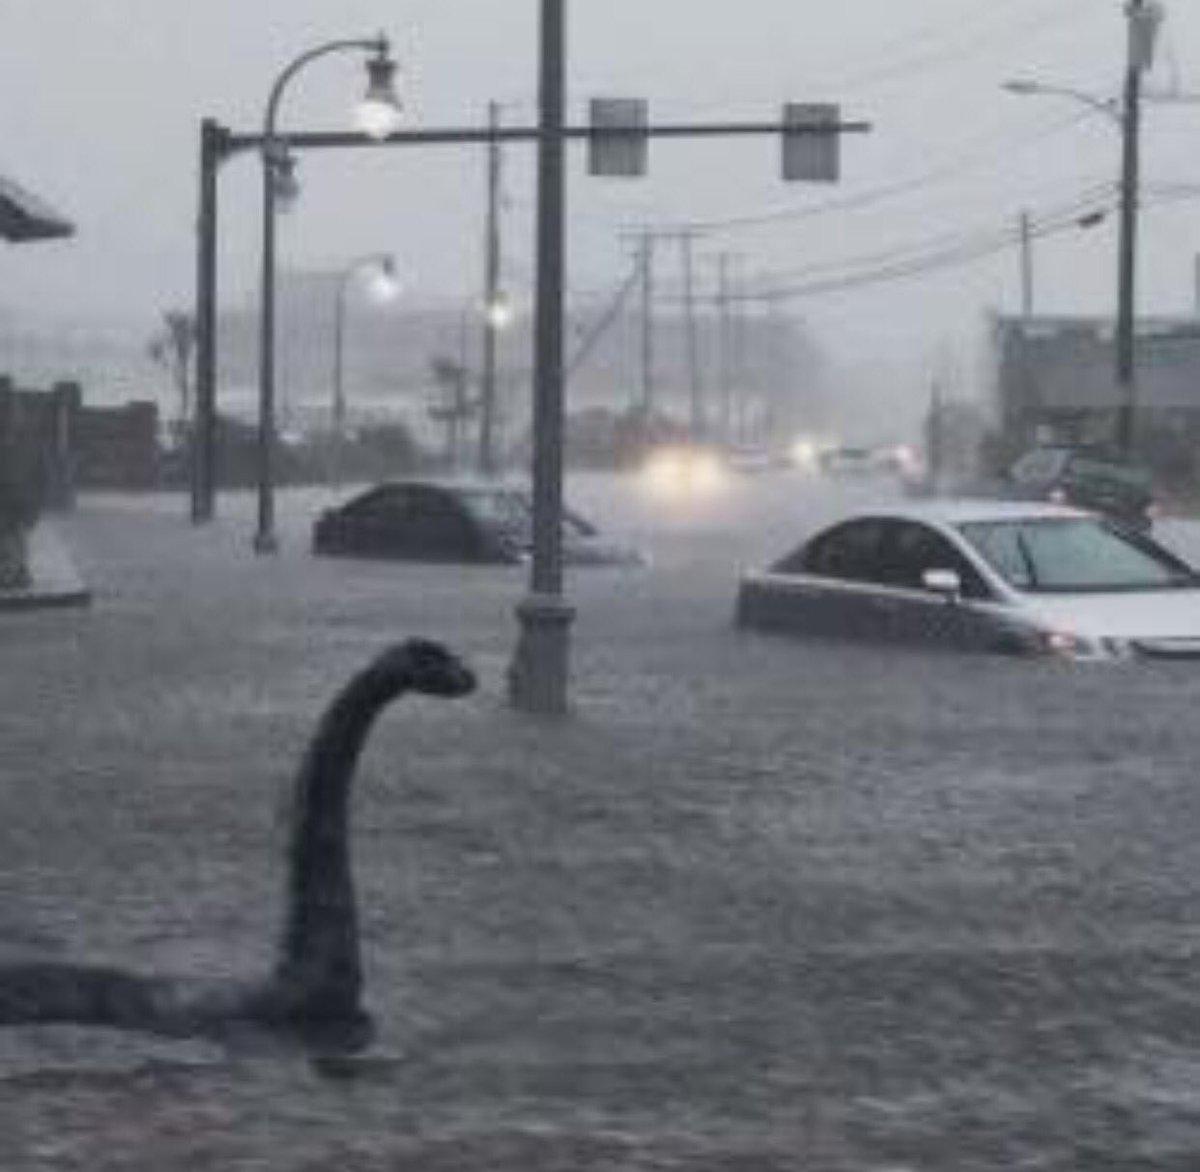 Nessy!!!!!!   #laflood https://t.co/KVdadoshqe